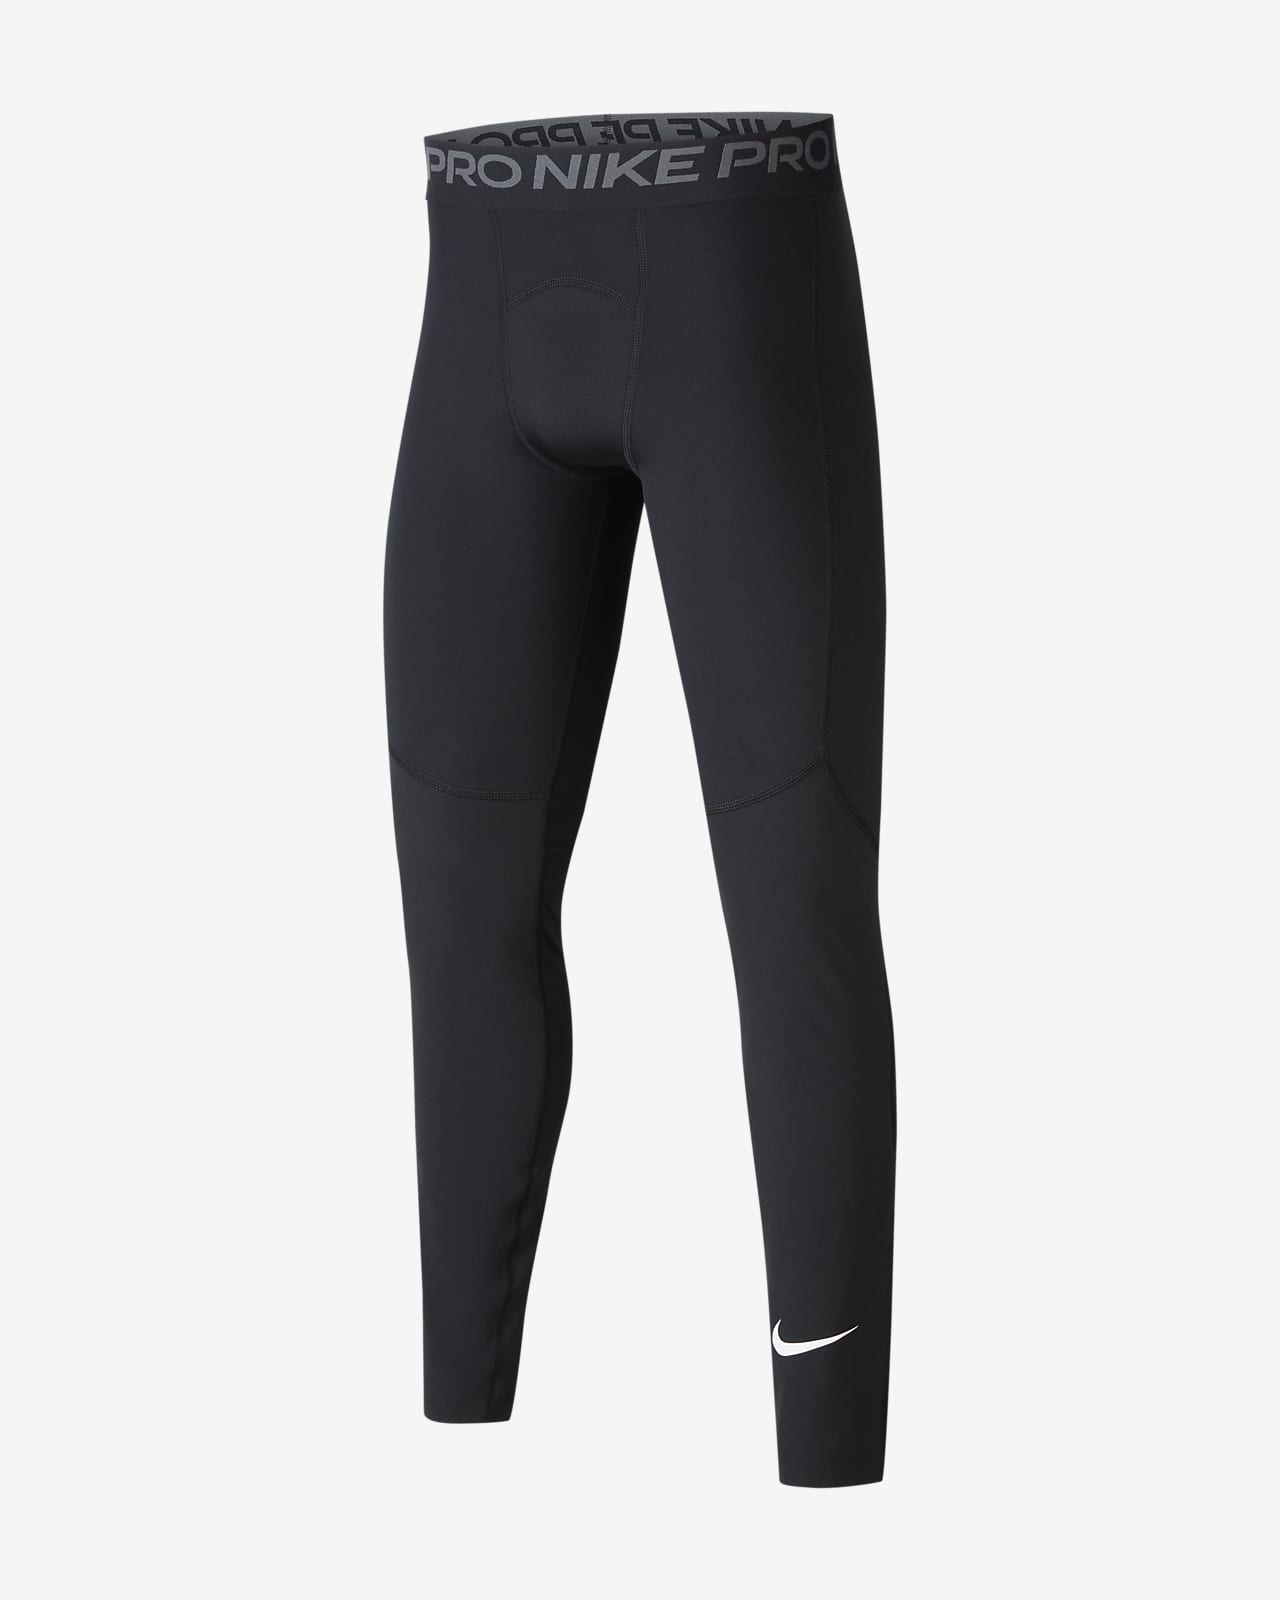 Tights Nike Pro - Ragazzo